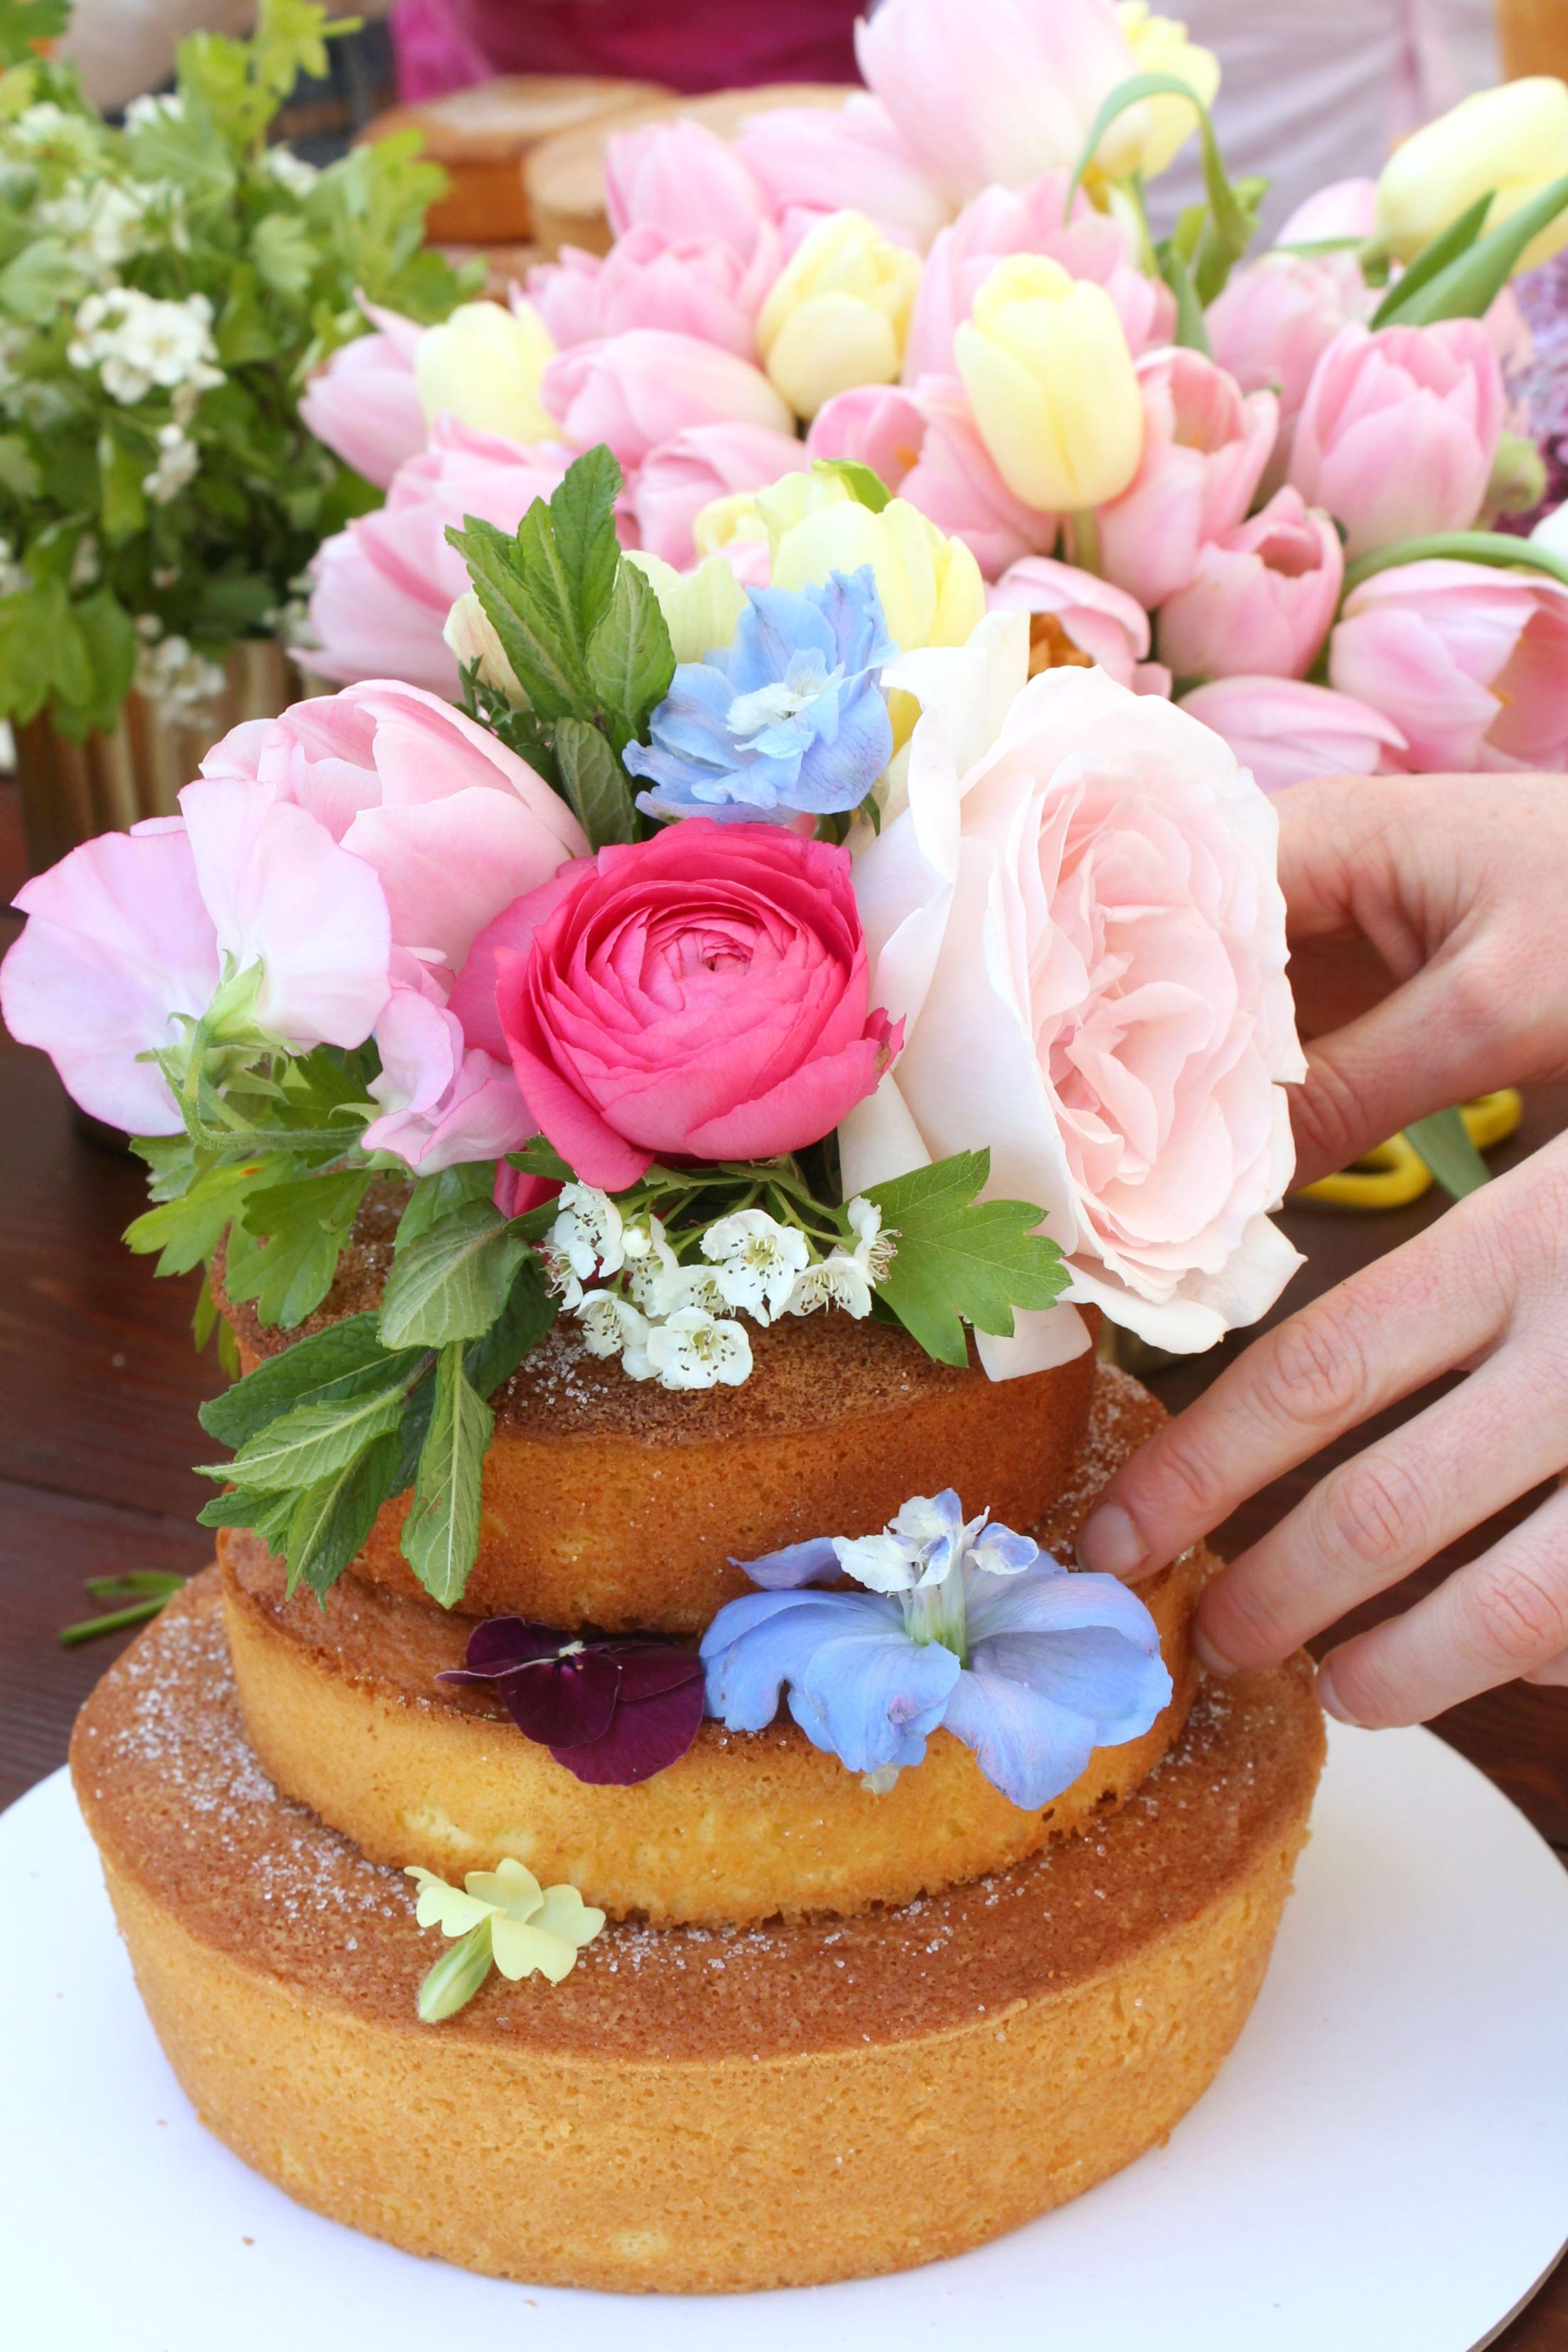 Cake-decorating-Kaleidotour-photo-by-Geraldine-Tan-Little-Big-Bell